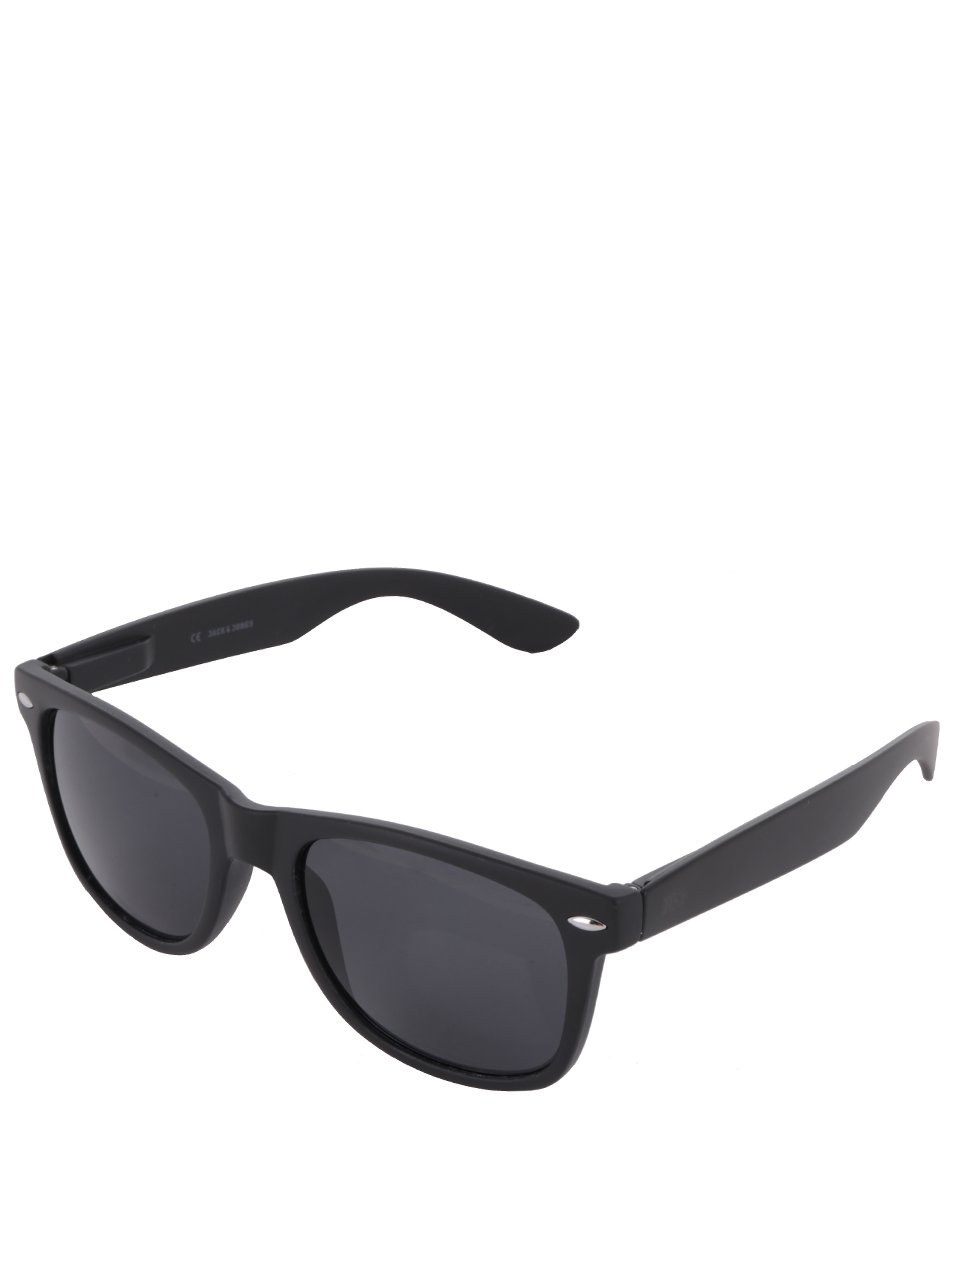 Čierne slnečné okuliare Jack   Jones Leo  28113d42cdf